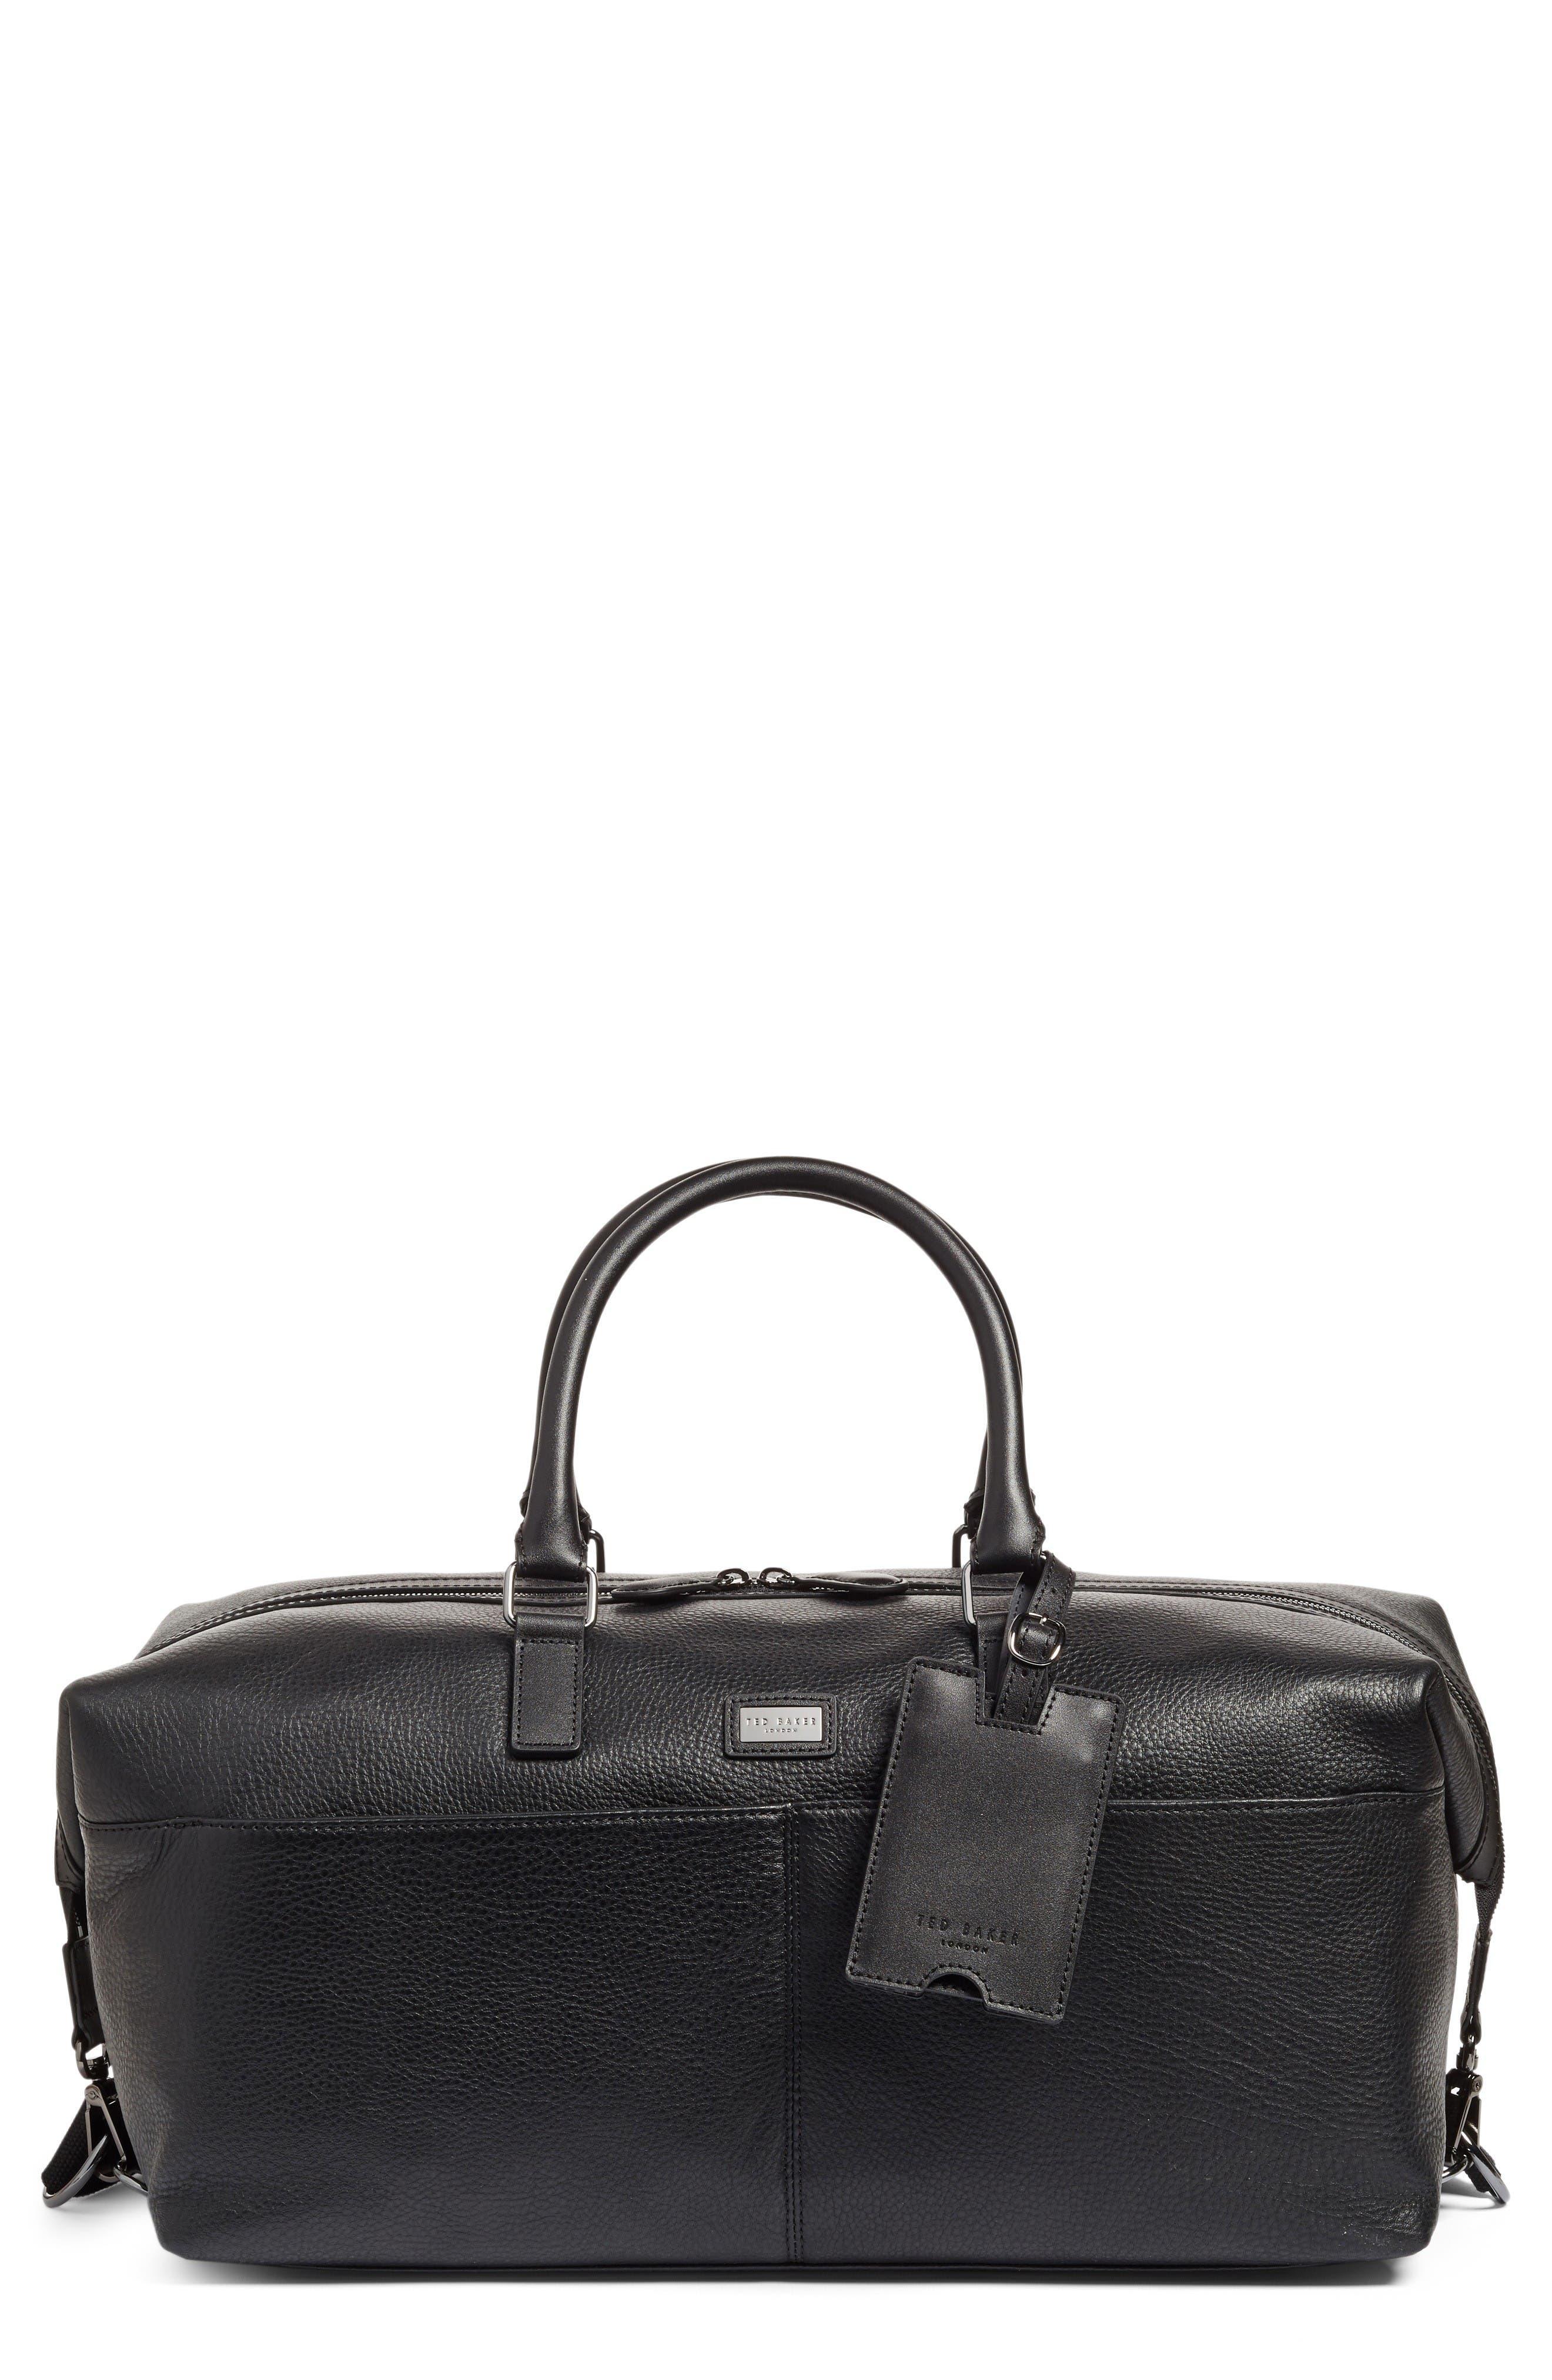 Leather Duffel Bag,                         Main,                         color, Black